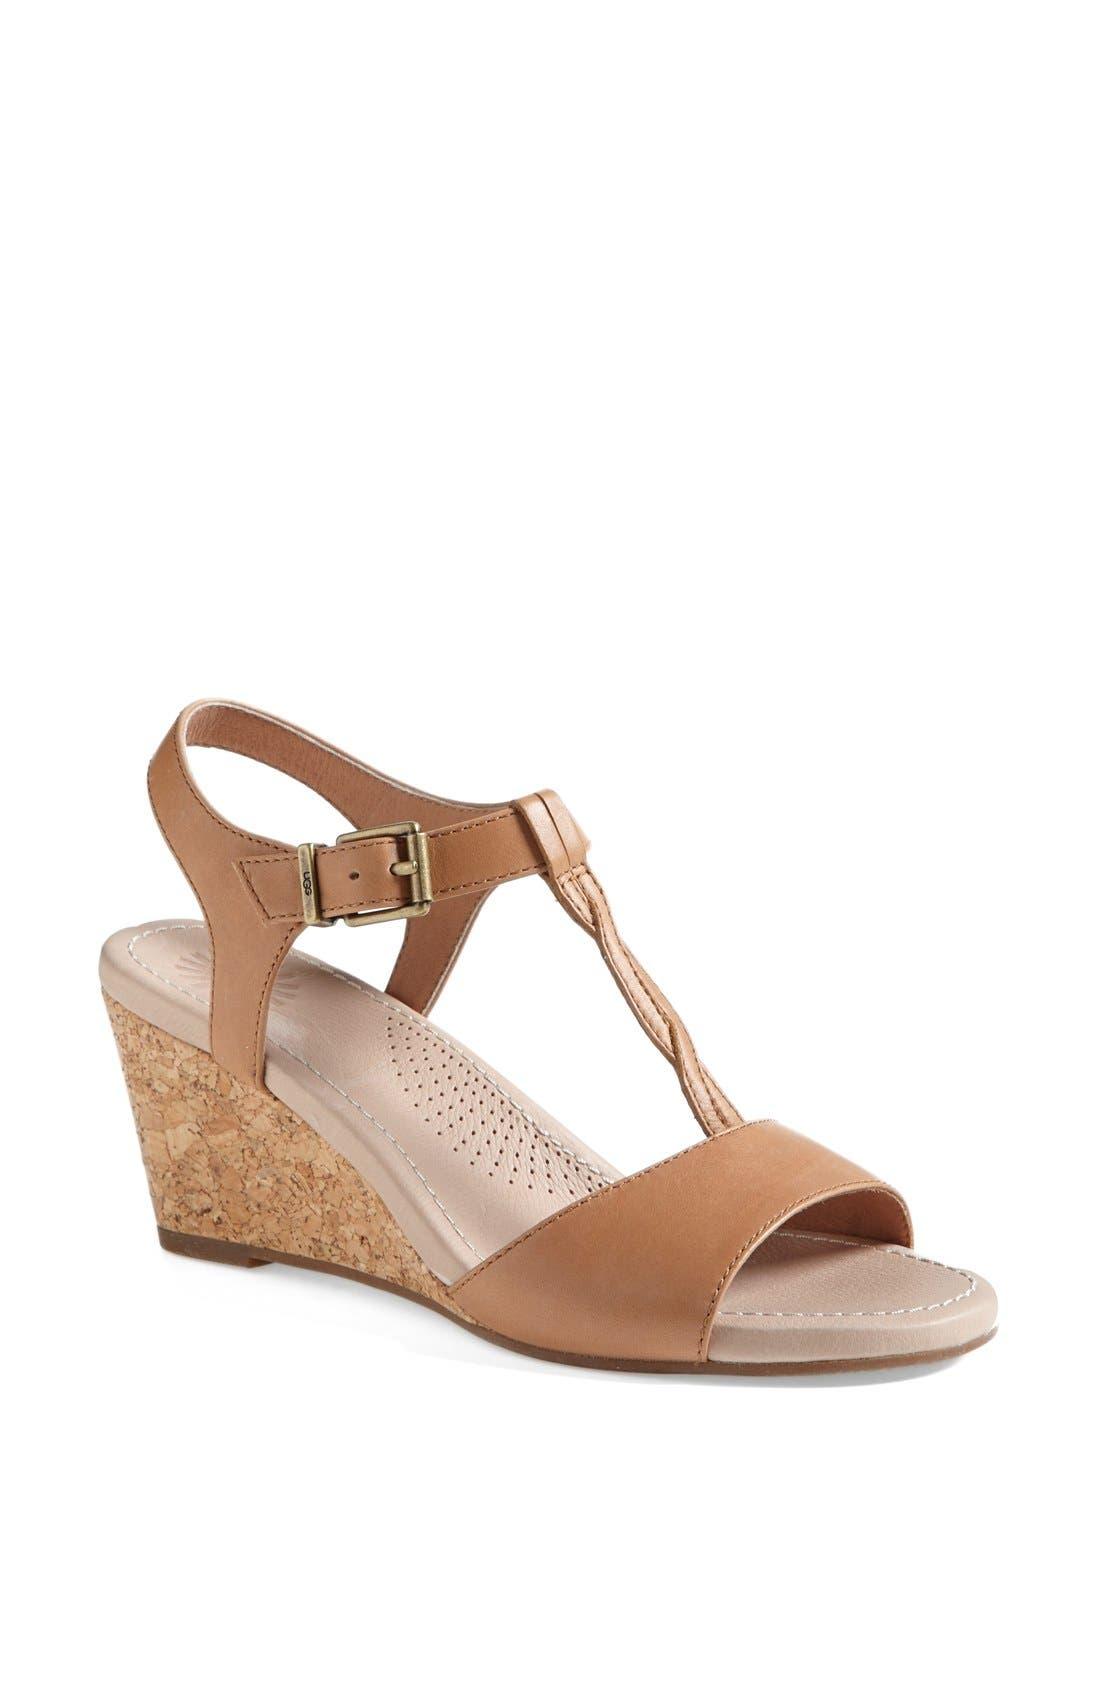 Main Image - UGG® Australia 'Arika' Sandal